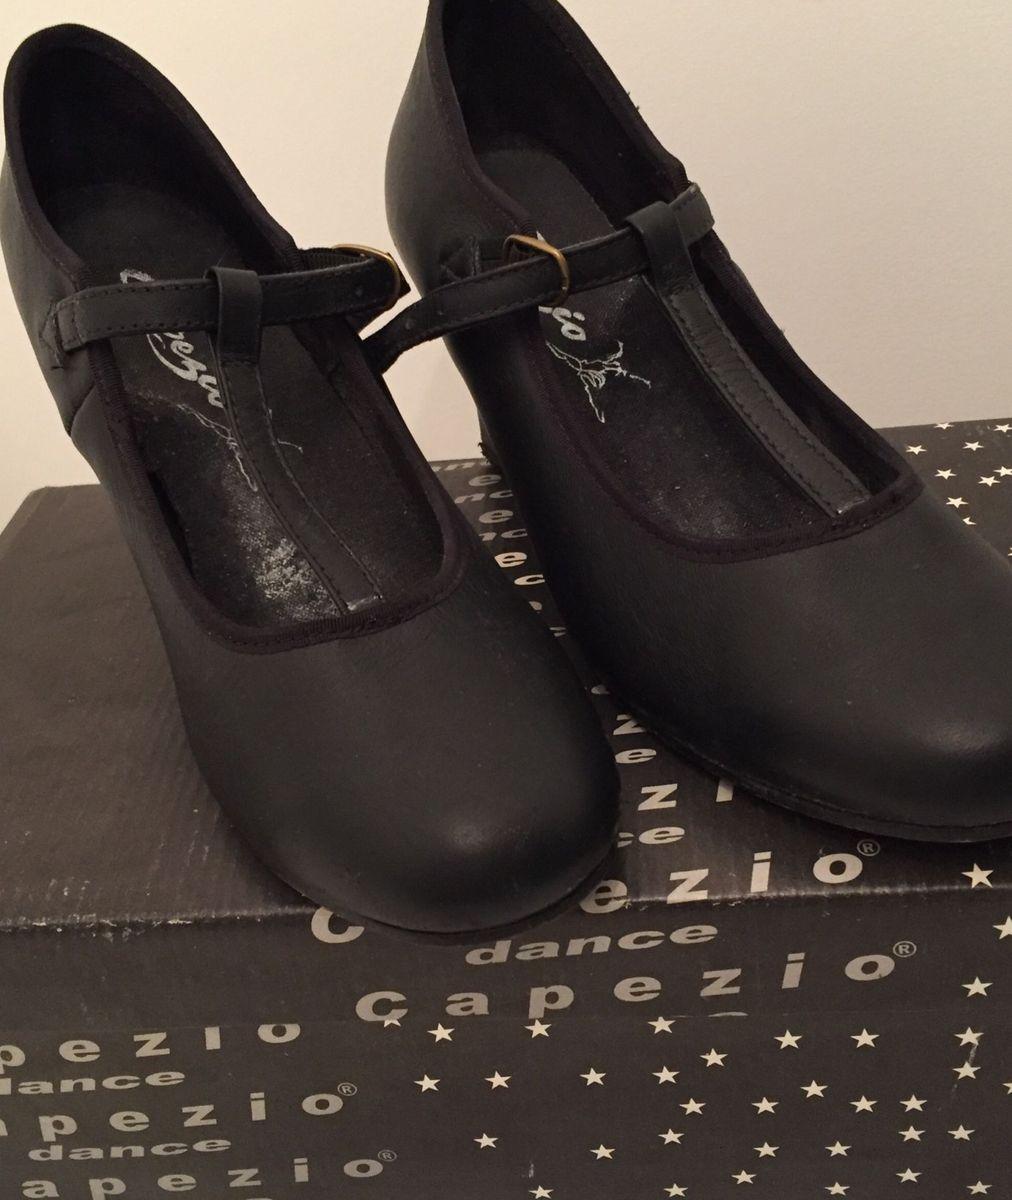 55e7e219e sapato de dança capezio - sapatos capezio.  Czm6ly9wag90b3muzw5qb2vplmnvbs5ici9wcm9kdwn0cy81mzc5mzi4l2iwntqxmwvmogqyytgymznkodmxmgnmndvlngq1zme5lmpwzw